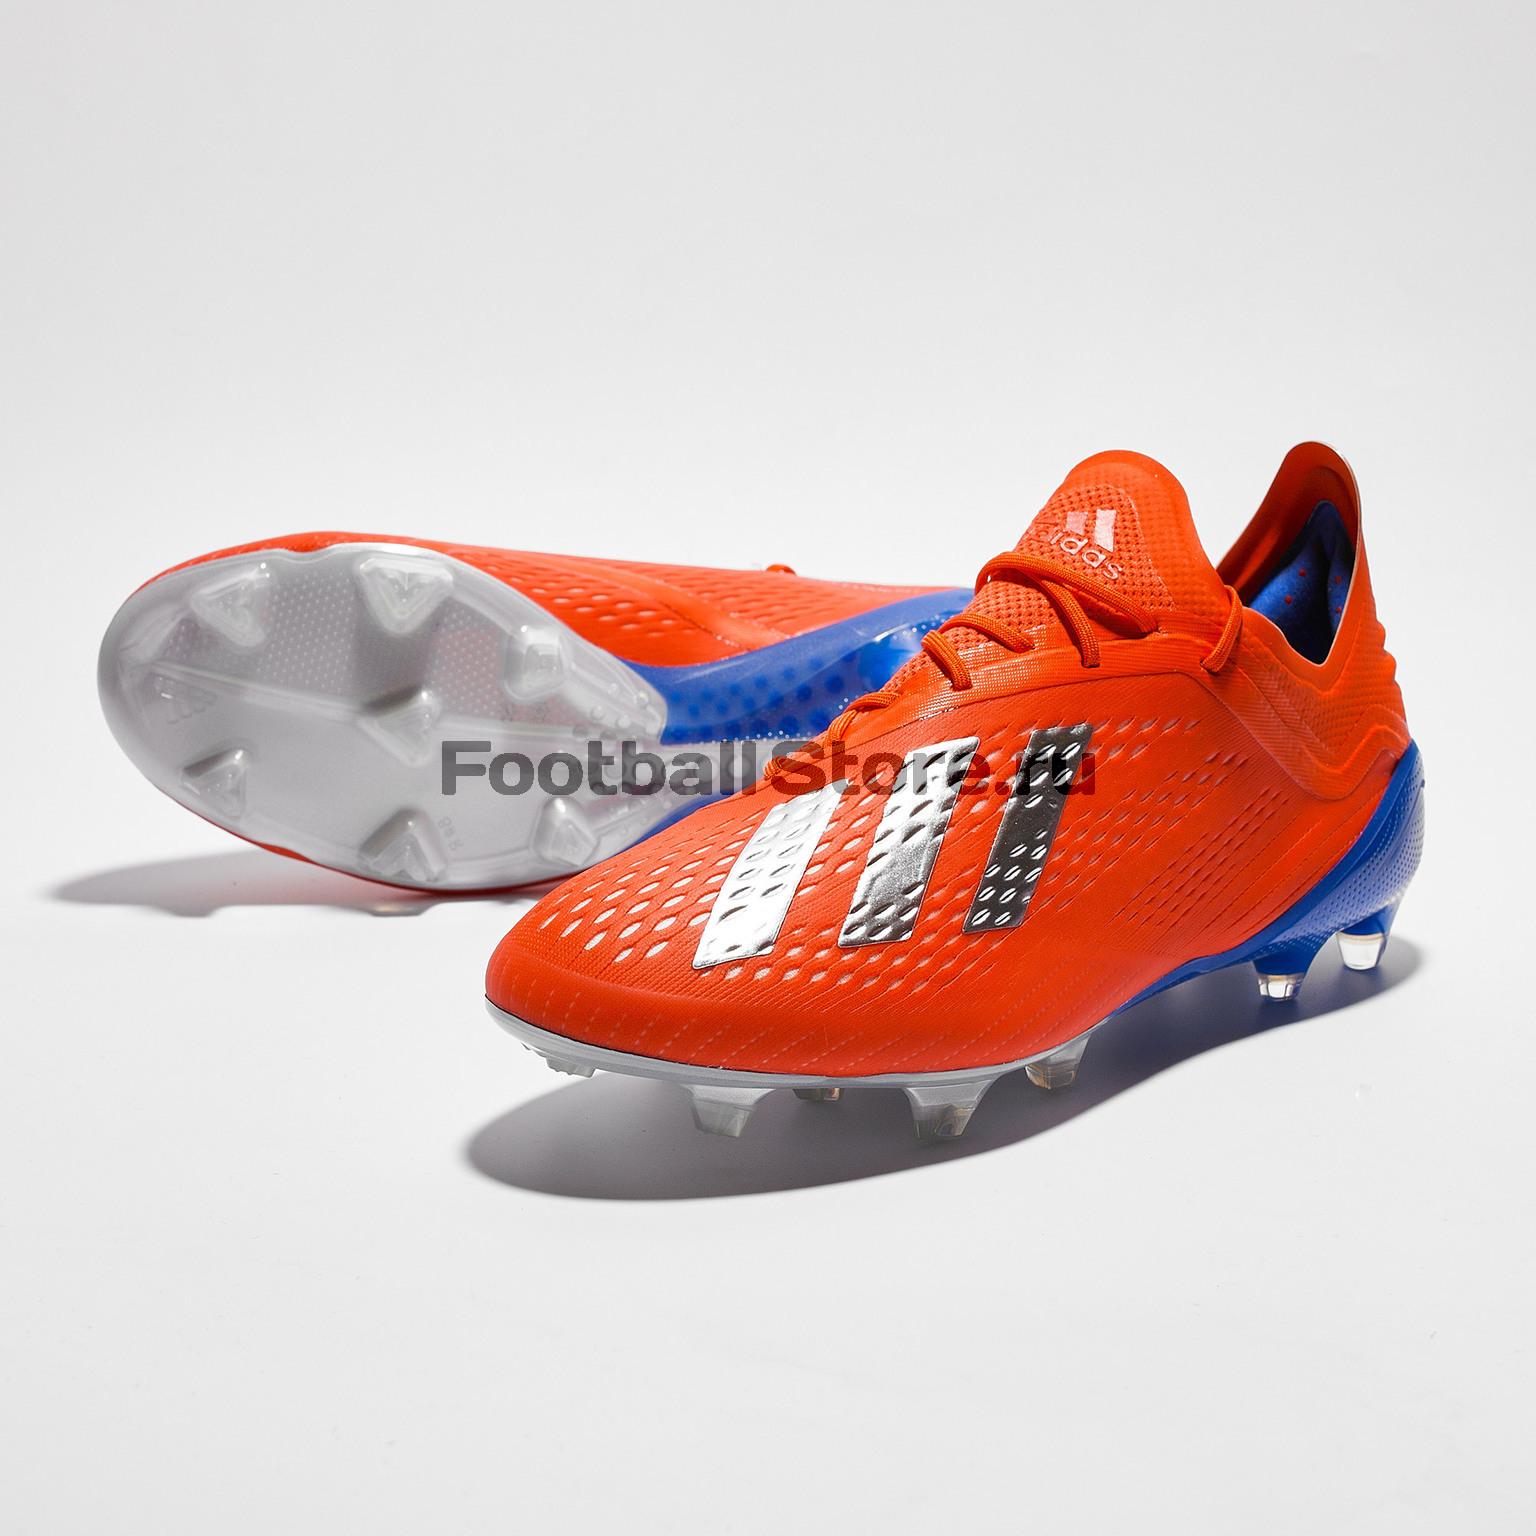 Бутсы Adidas X 18.1 FG BB9347 – купить